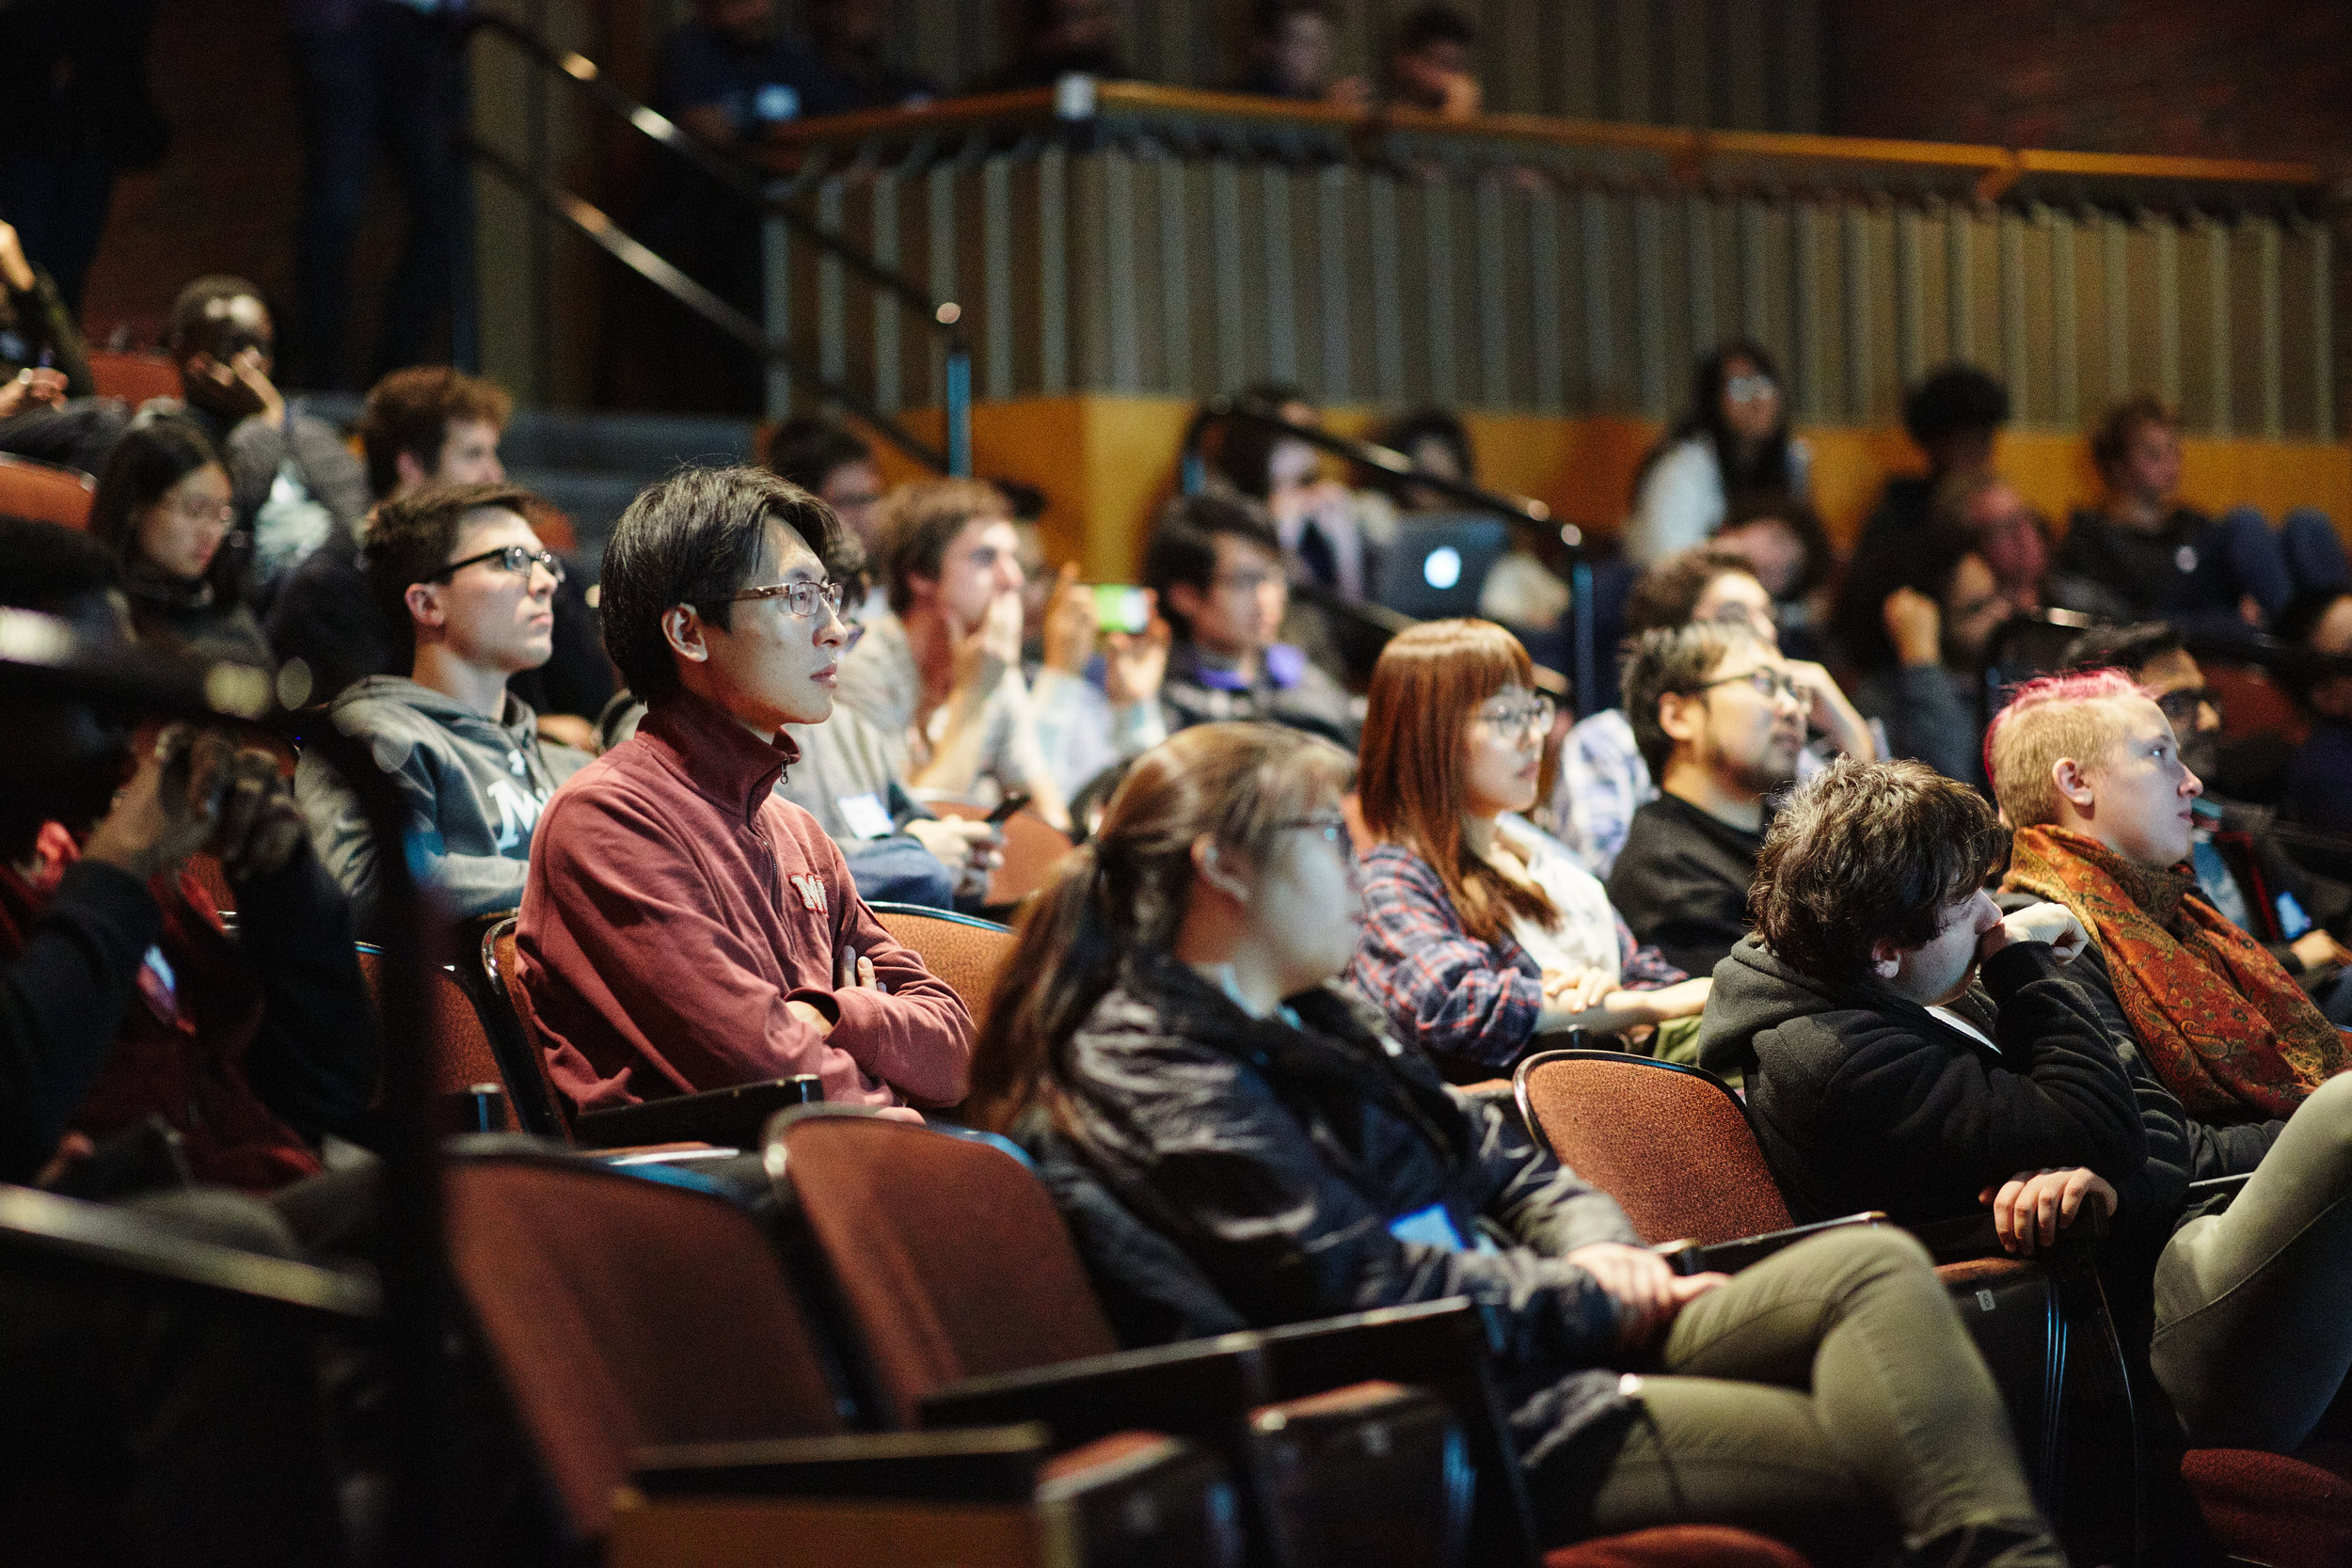 Bose Challenge: Carnegie Mellon University - October 18th, 2018